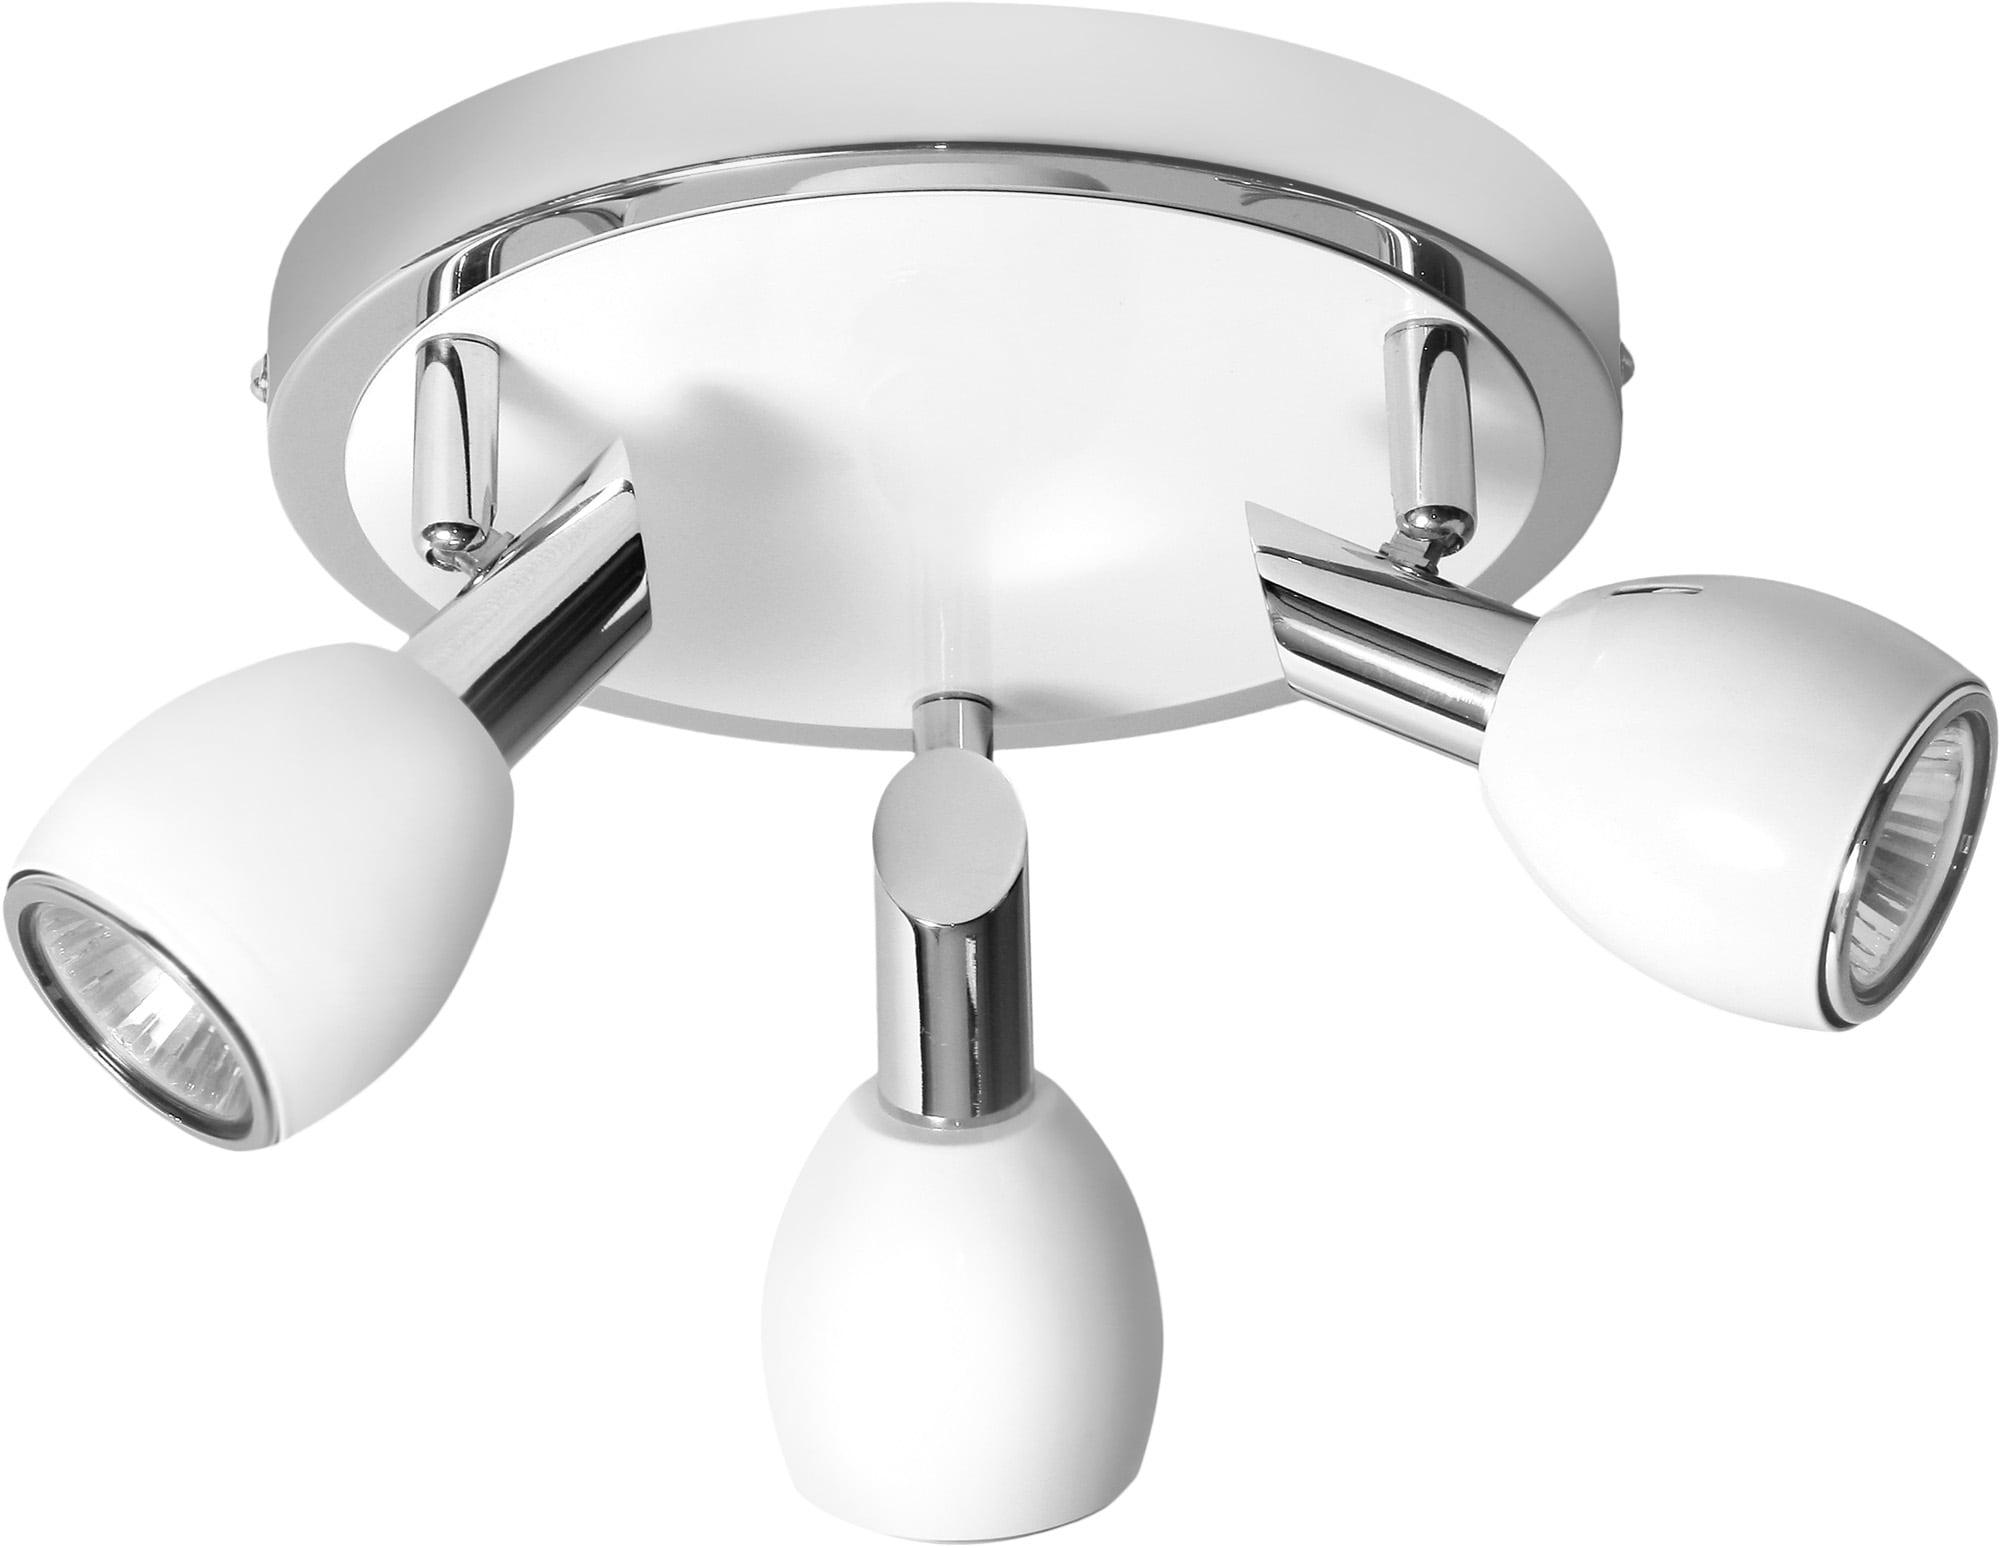 Ceiling lamp Spotlights White Colors Chrome GU10